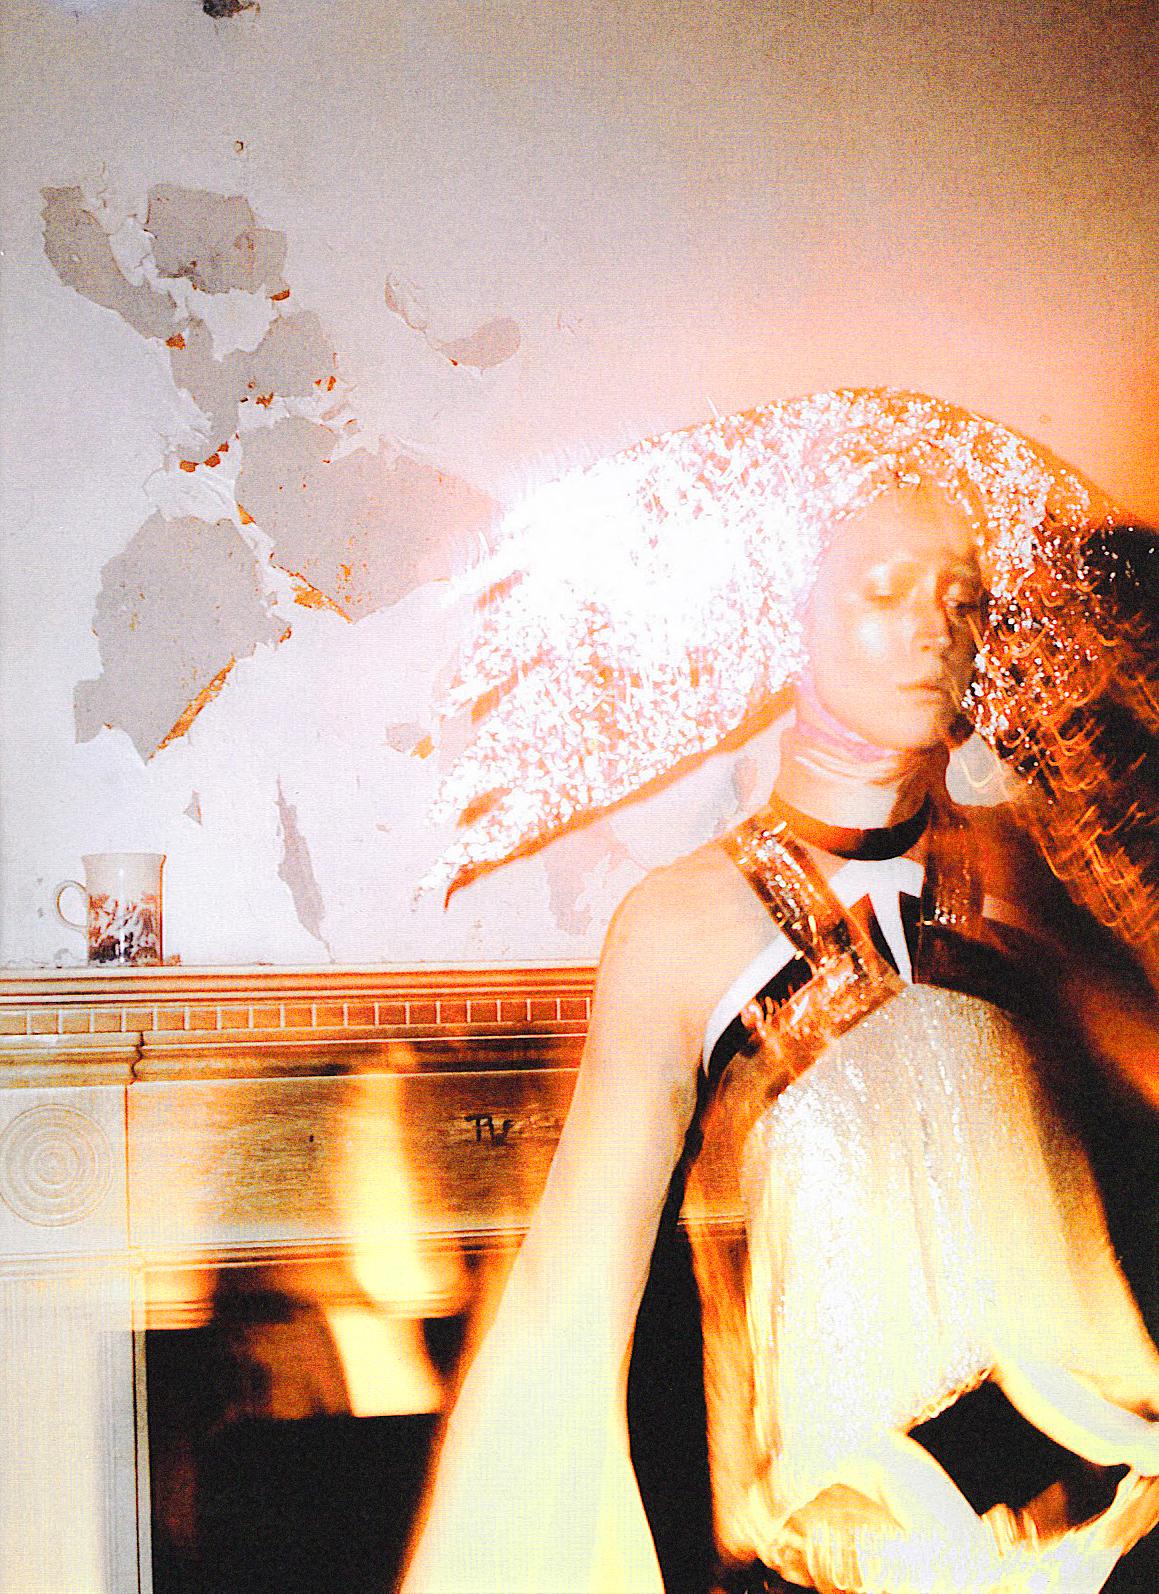 """Spellbound"" with Raquel Zimmermann + Lucia Pieroni + Guido Palau + Joe McKenna + V Magazine Frocks = Nicolas Ghesquière for Balenciaga"